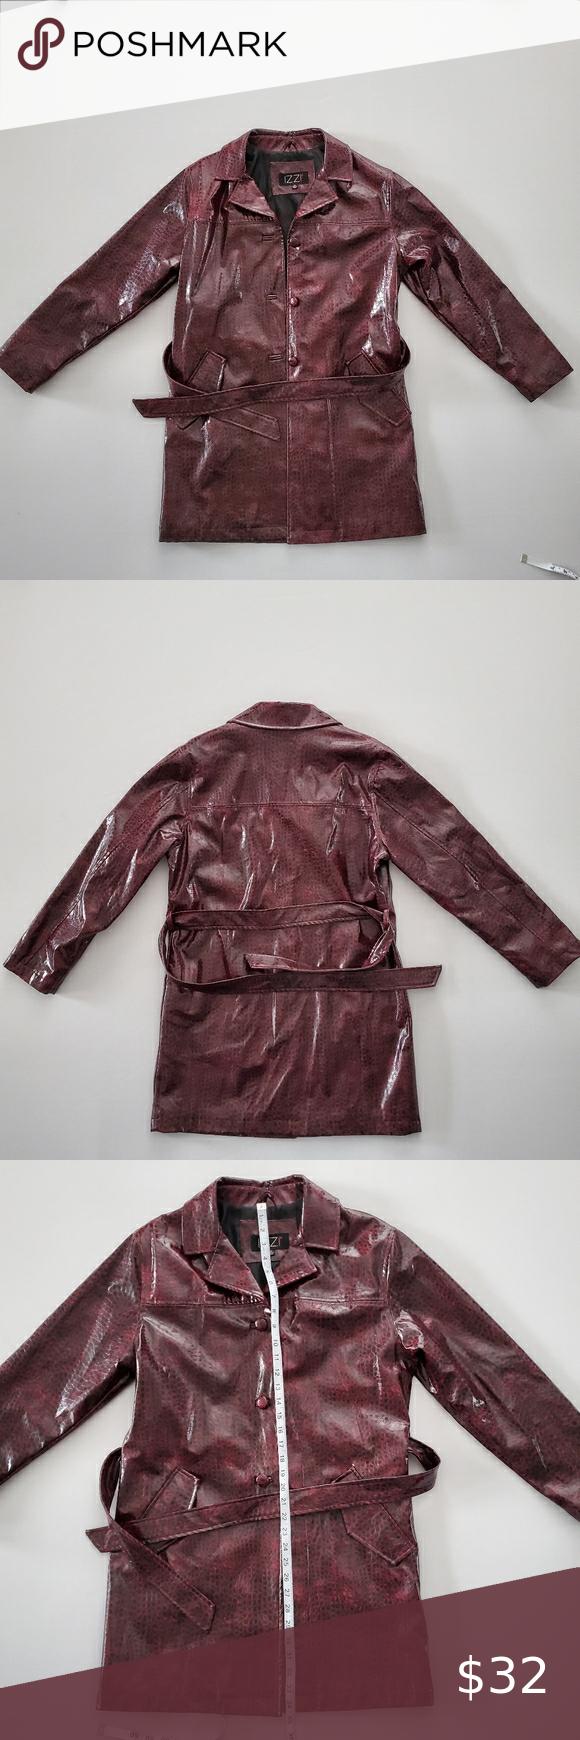 Women S Jacket Coat Izzi Coats Jackets Women Jackets For Women Fashion [ 1740 x 580 Pixel ]